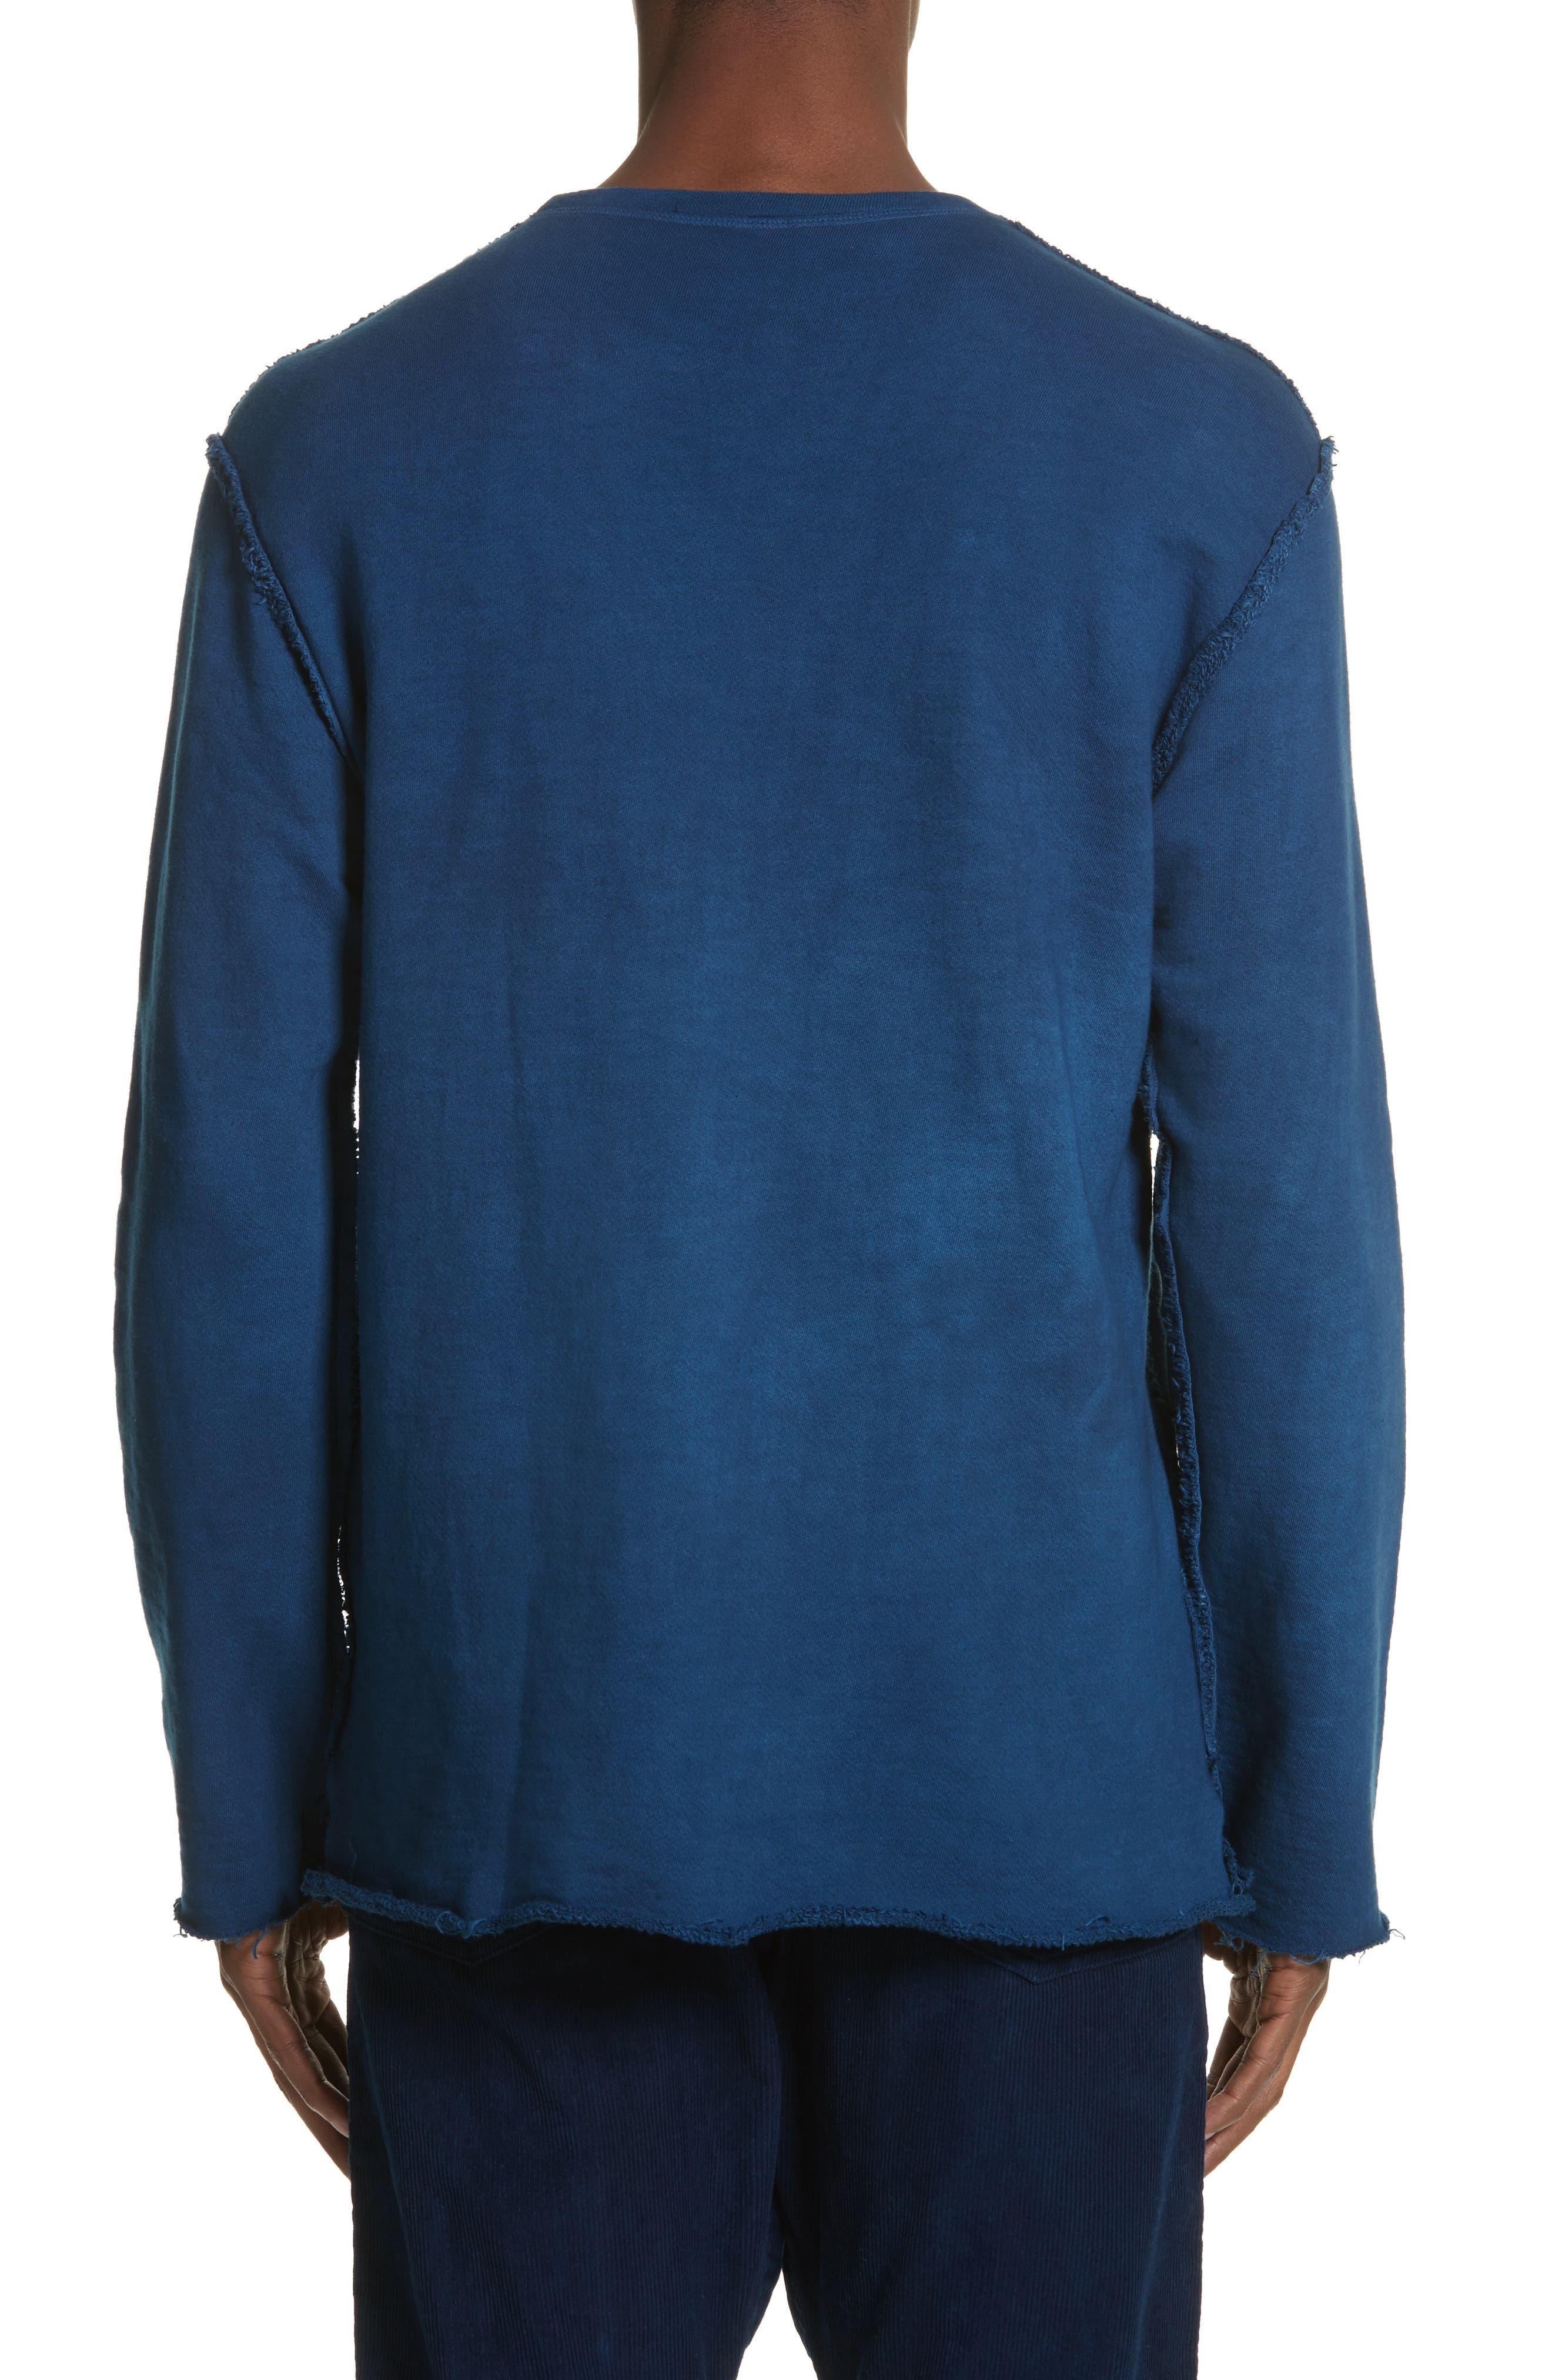 Alternate Image 3  - Dr. Collectors Malibu Reversible Sweatshirt